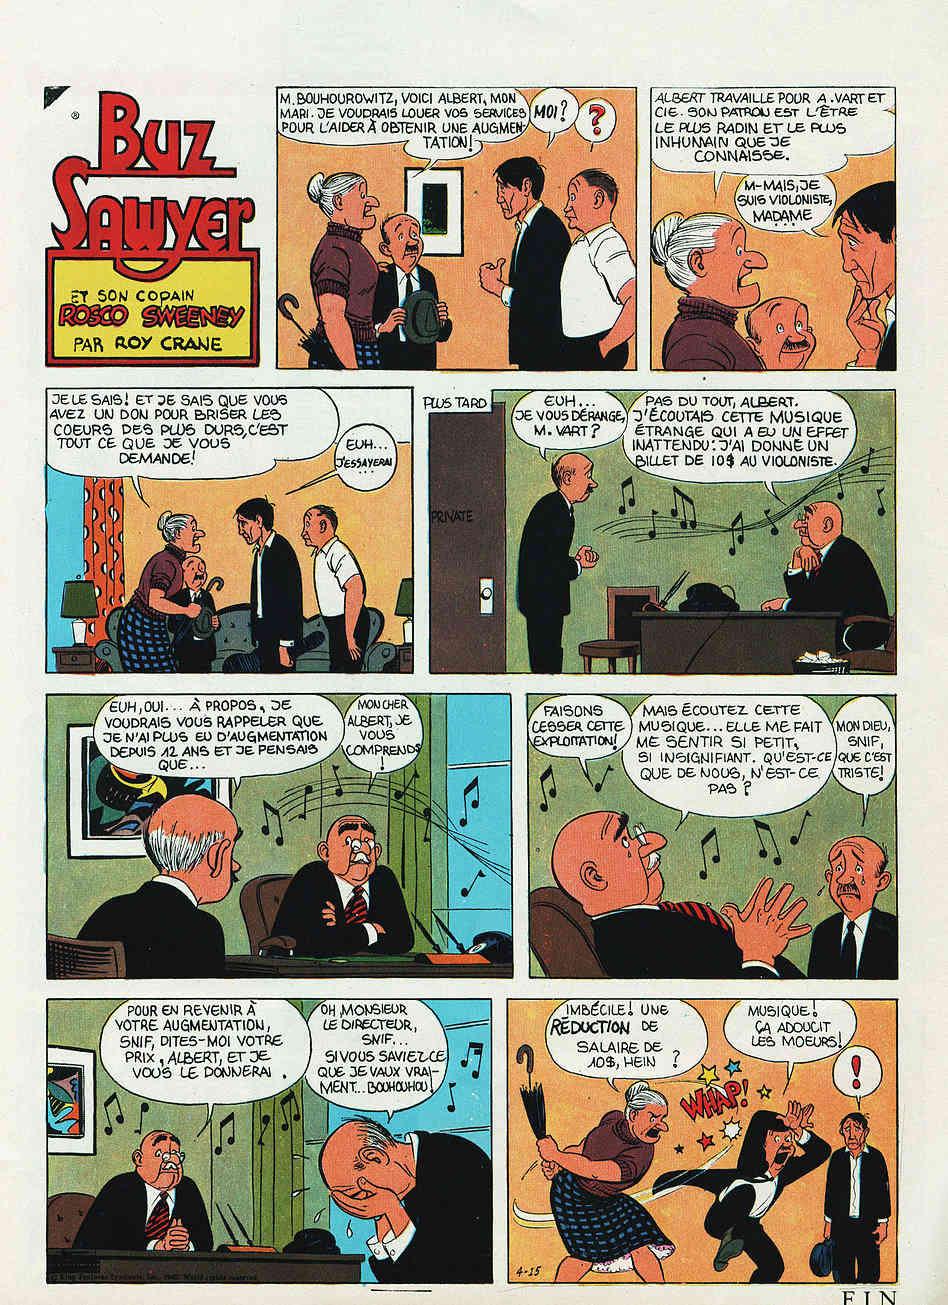 Wash Tubbs, Buz Sawyer par Roy Crane - Page 3 Cranes17